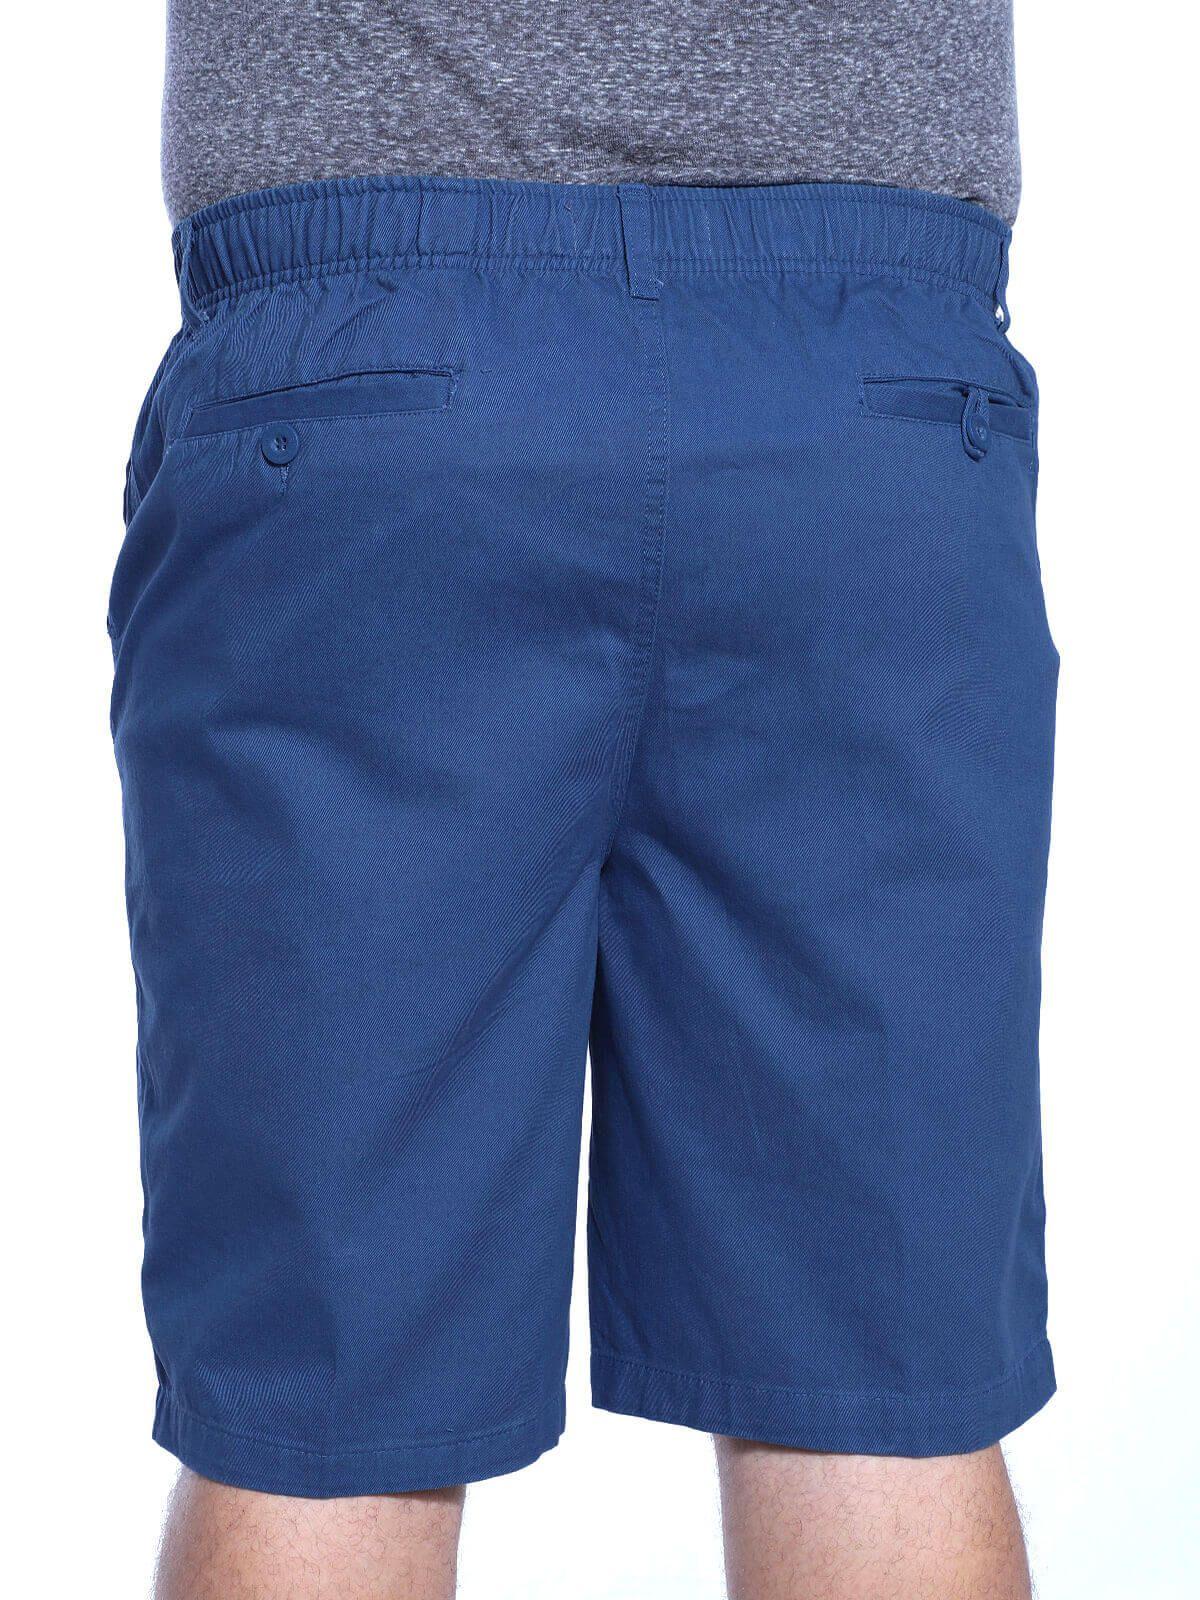 Bermuda Plus Size Anistia Sarja de Elástico Azul Jeans